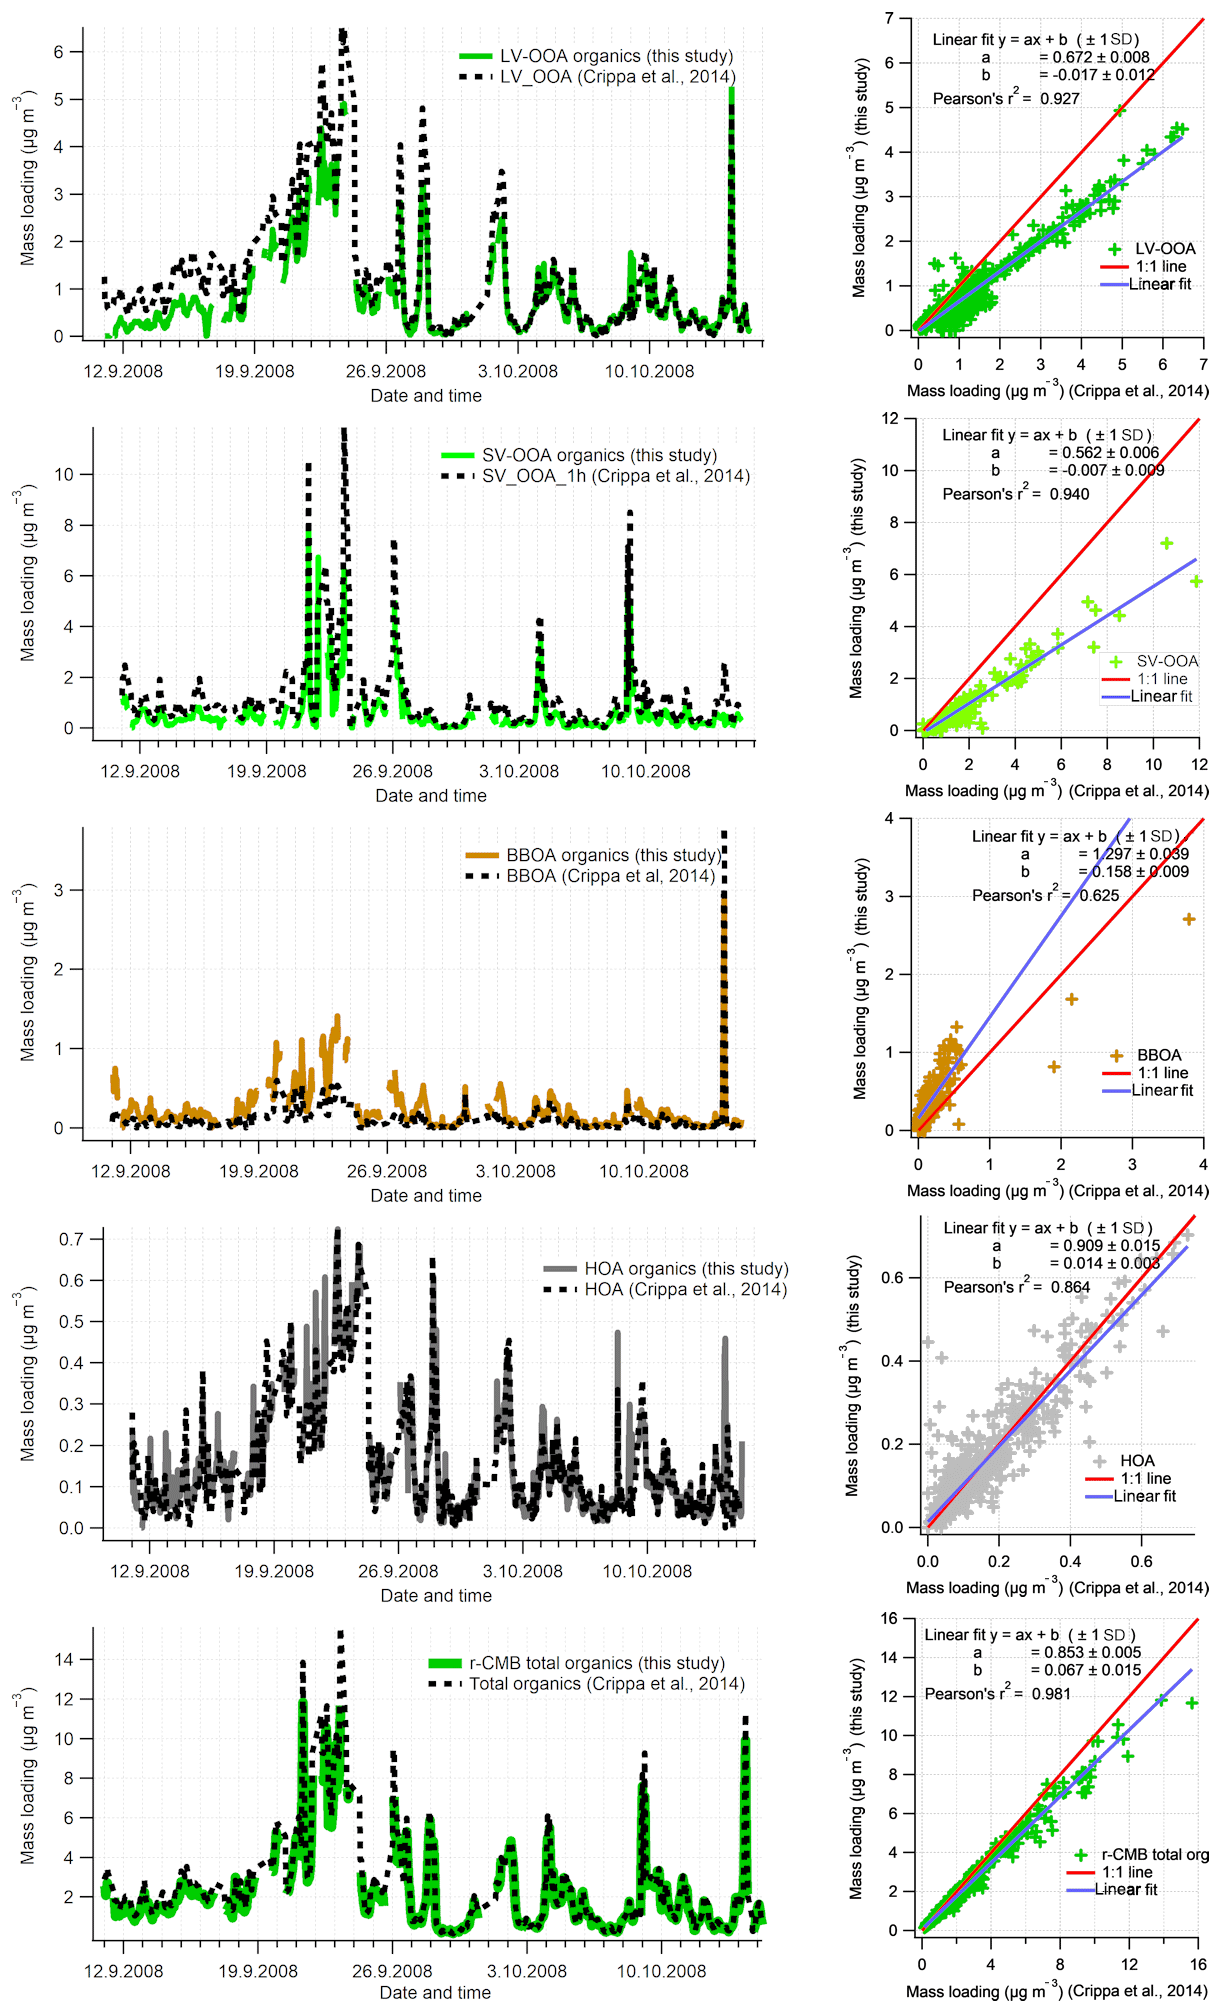 ACP - Constructing a data-driven receptor model for organic